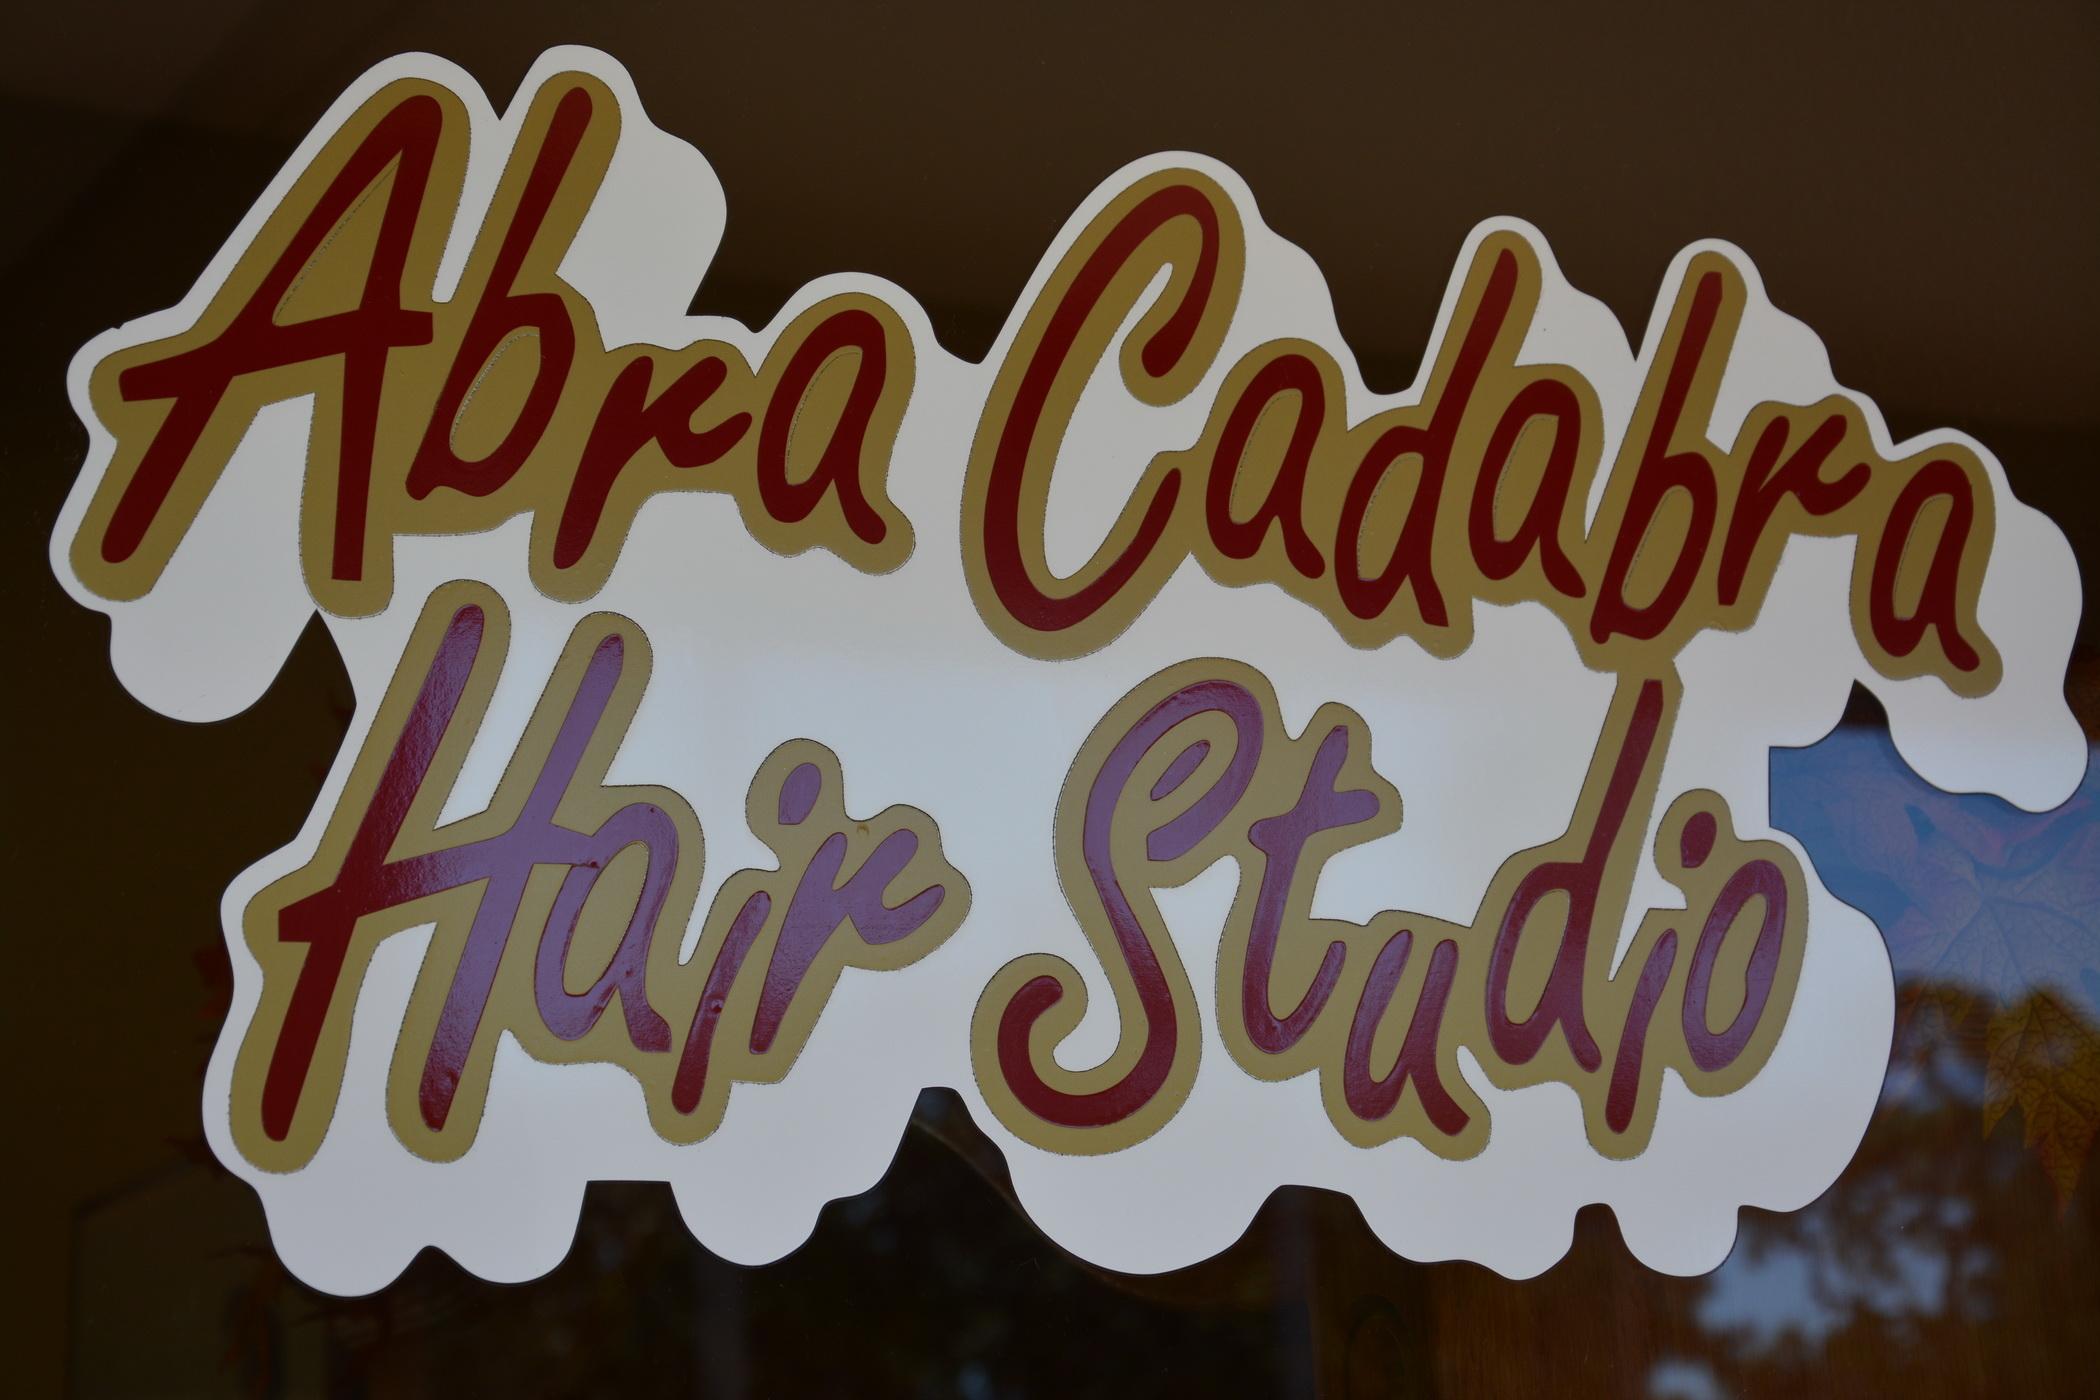 Abra Cadabra Hair Studio image 1